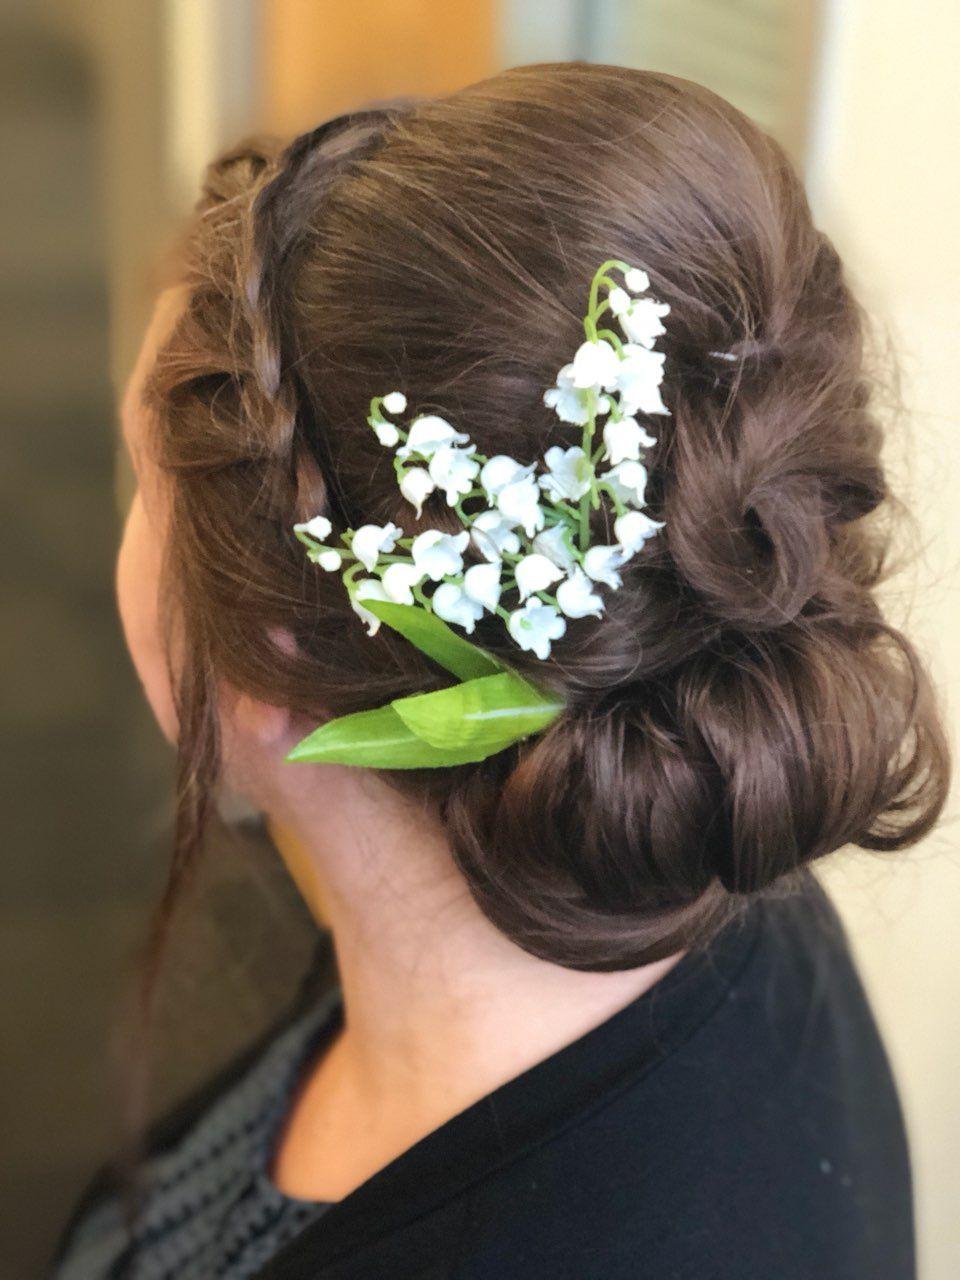 beauty by hazel skye san francisco bay area bridal hair and